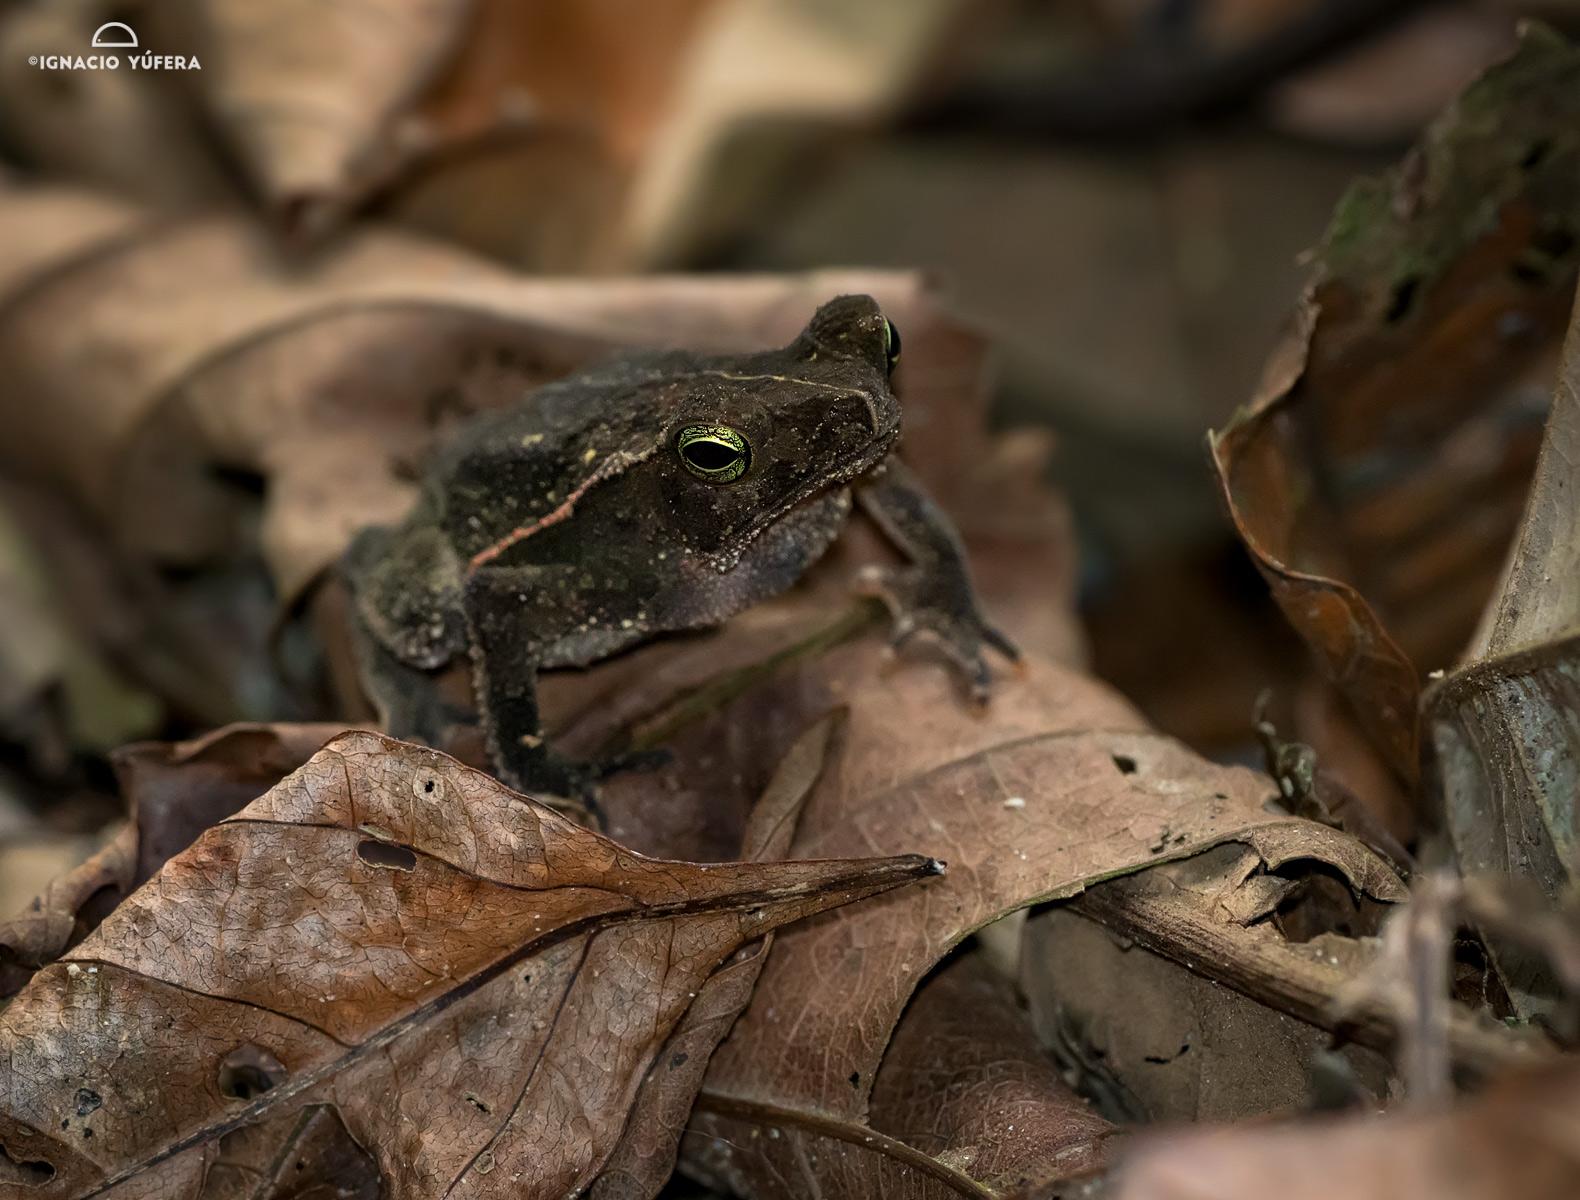 Leaf-litter toad (Rhinella alata), Gamboa, Panama